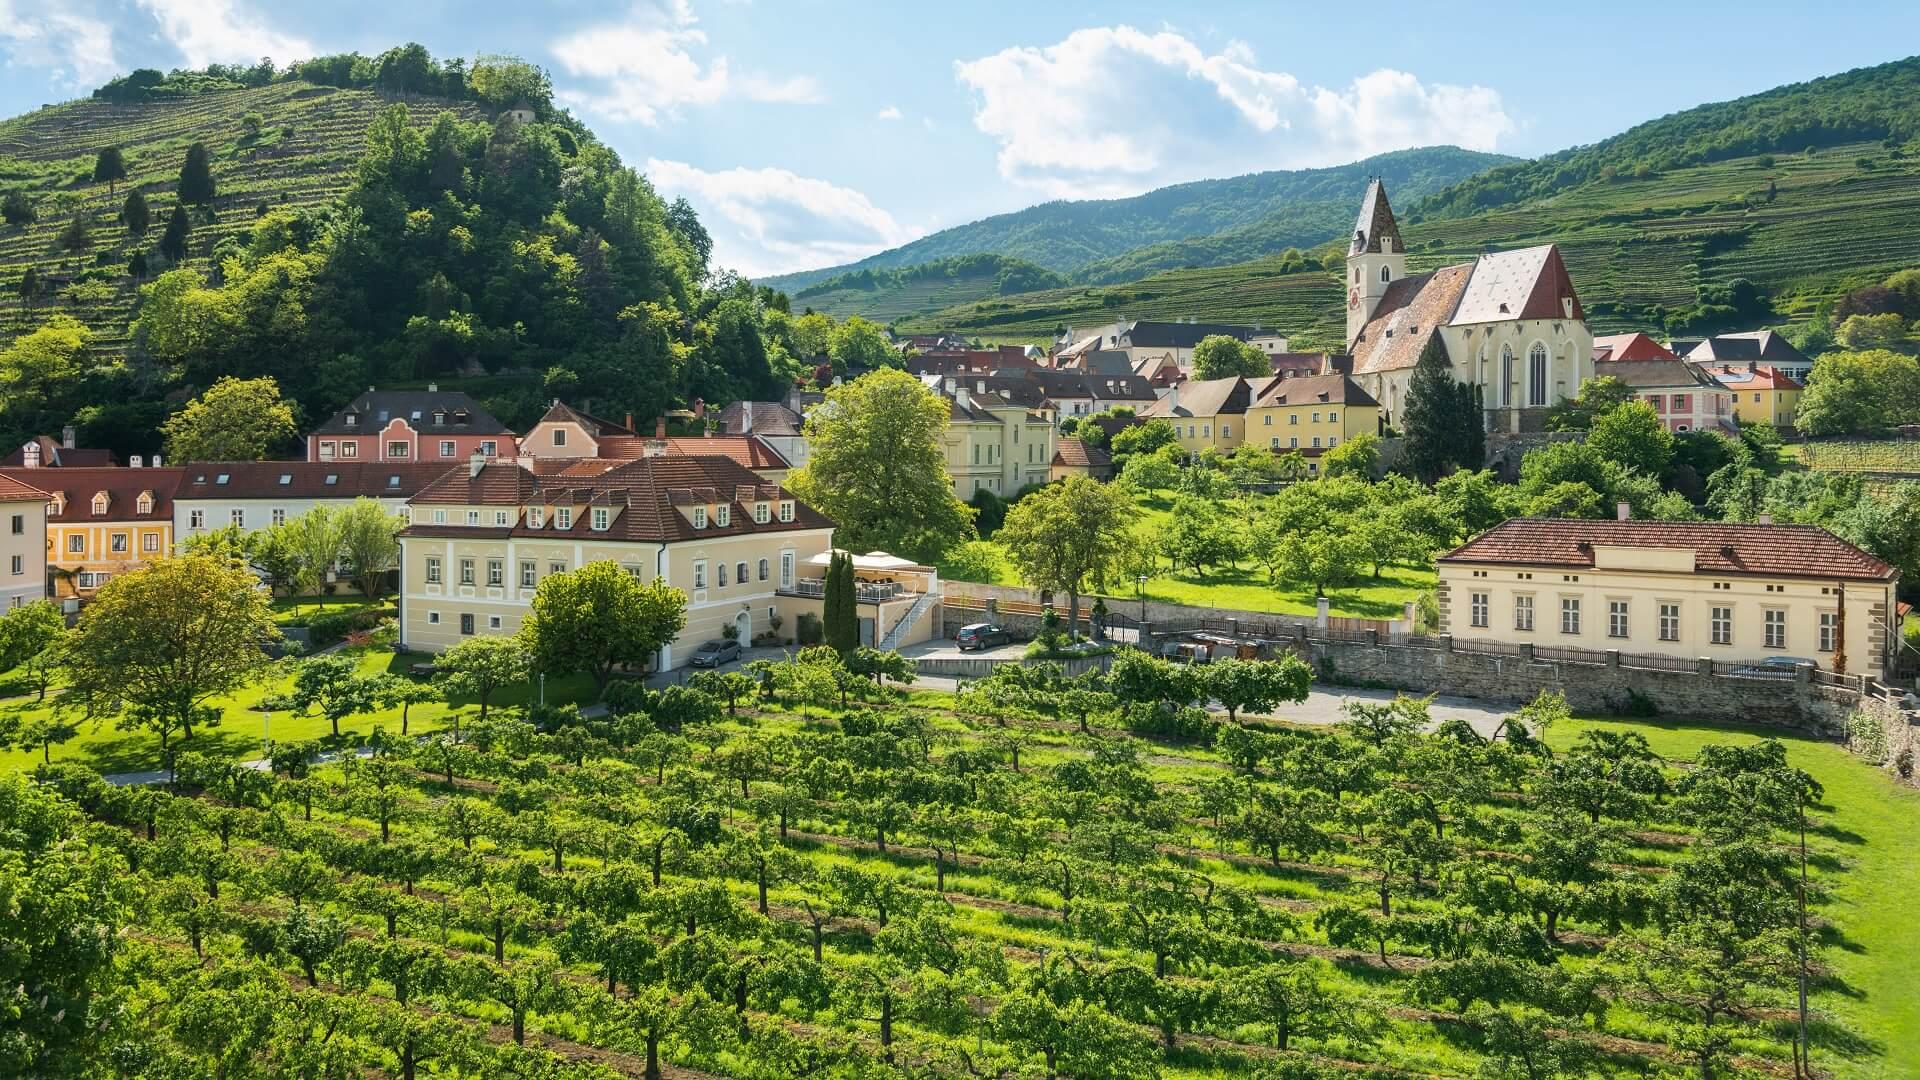 Spitz an der Donau im Frühjahr. (Wachau)